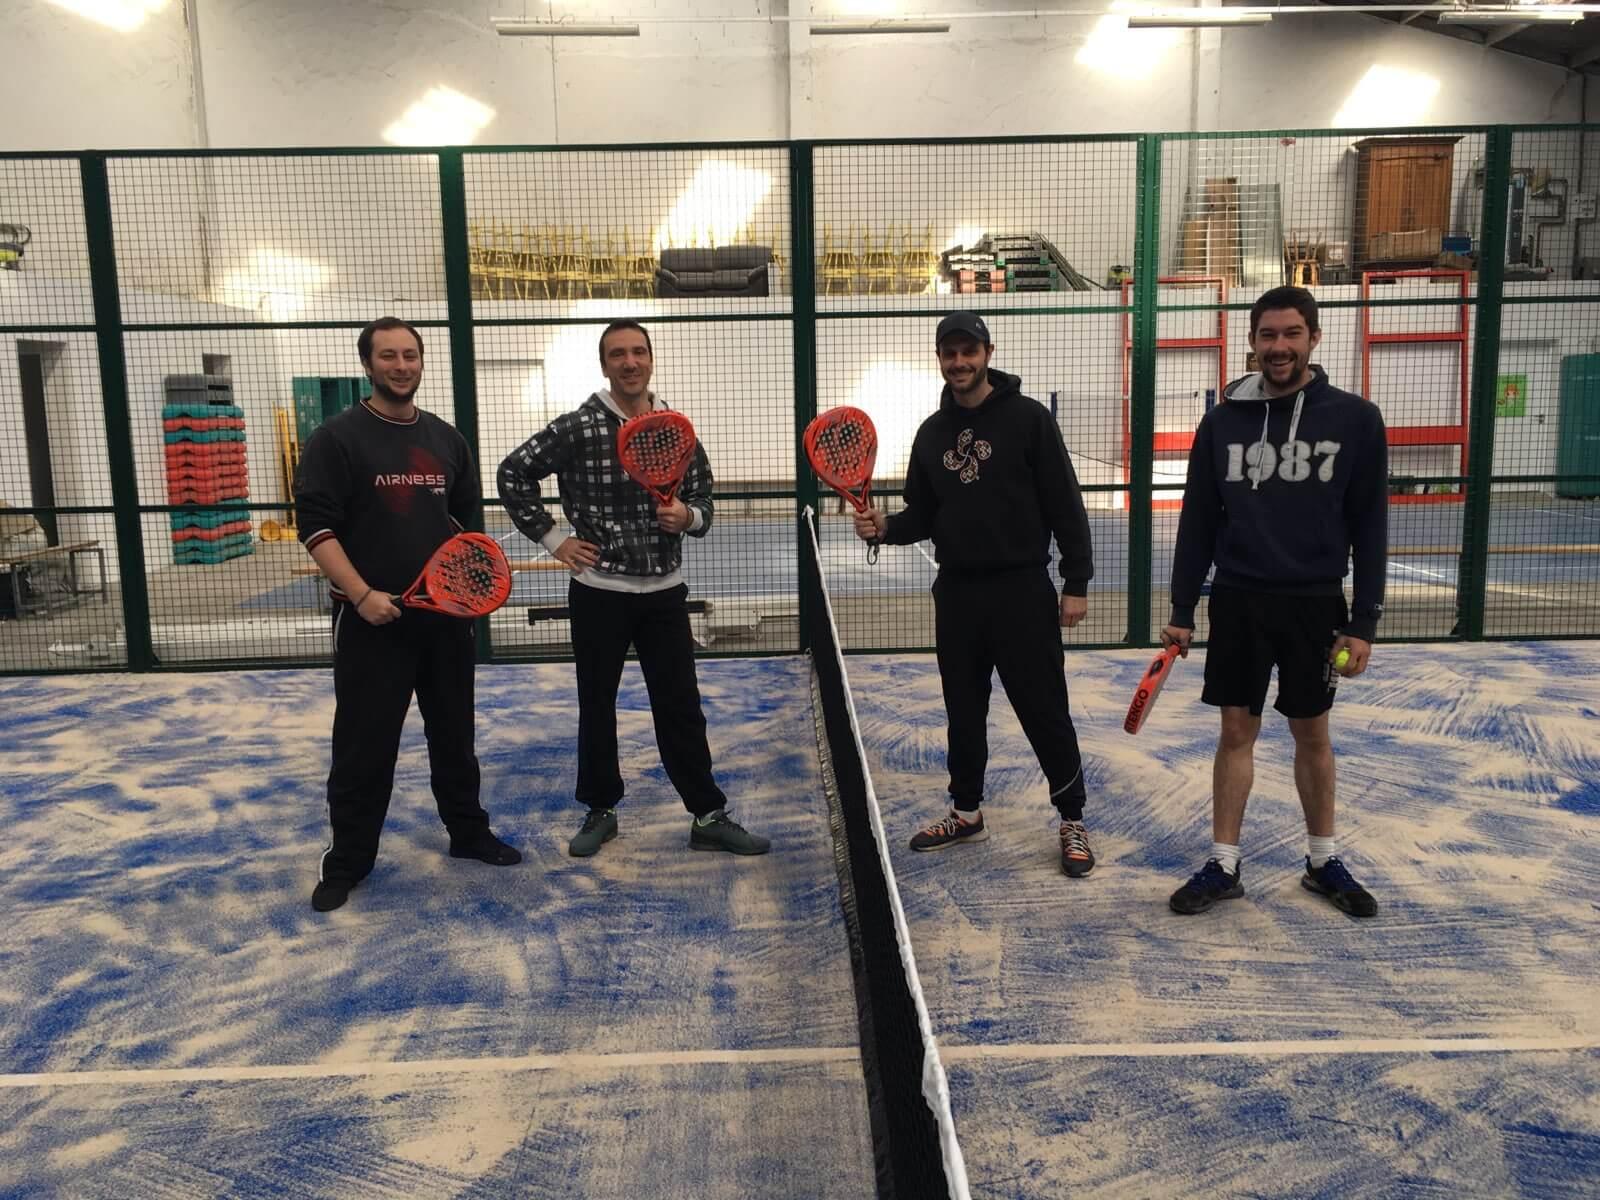 4 amis sur un terrain de Padel Tennis indoor avec raquette à la main